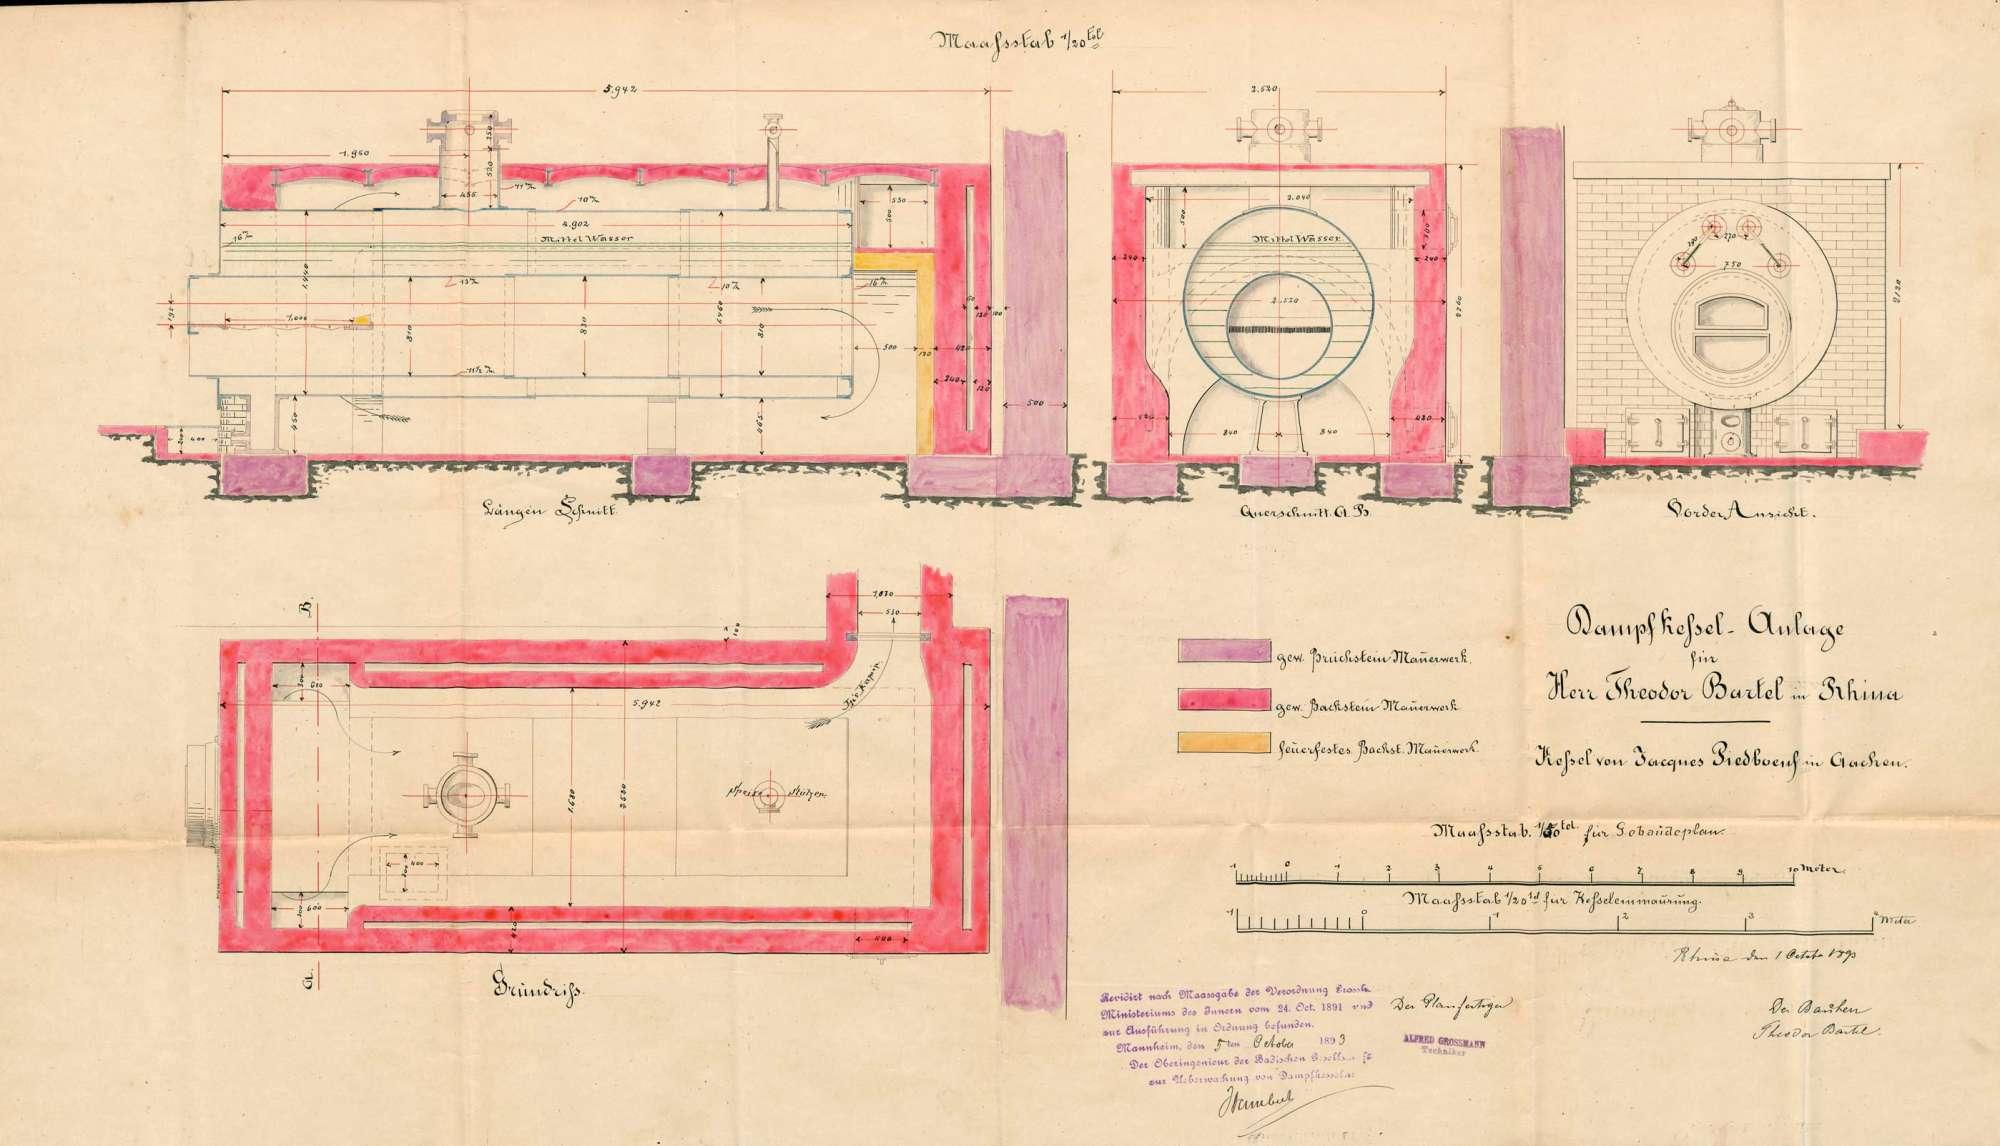 Dampfkessel der Firma Färberei Theodor Bartel in Rhina, Bild 2